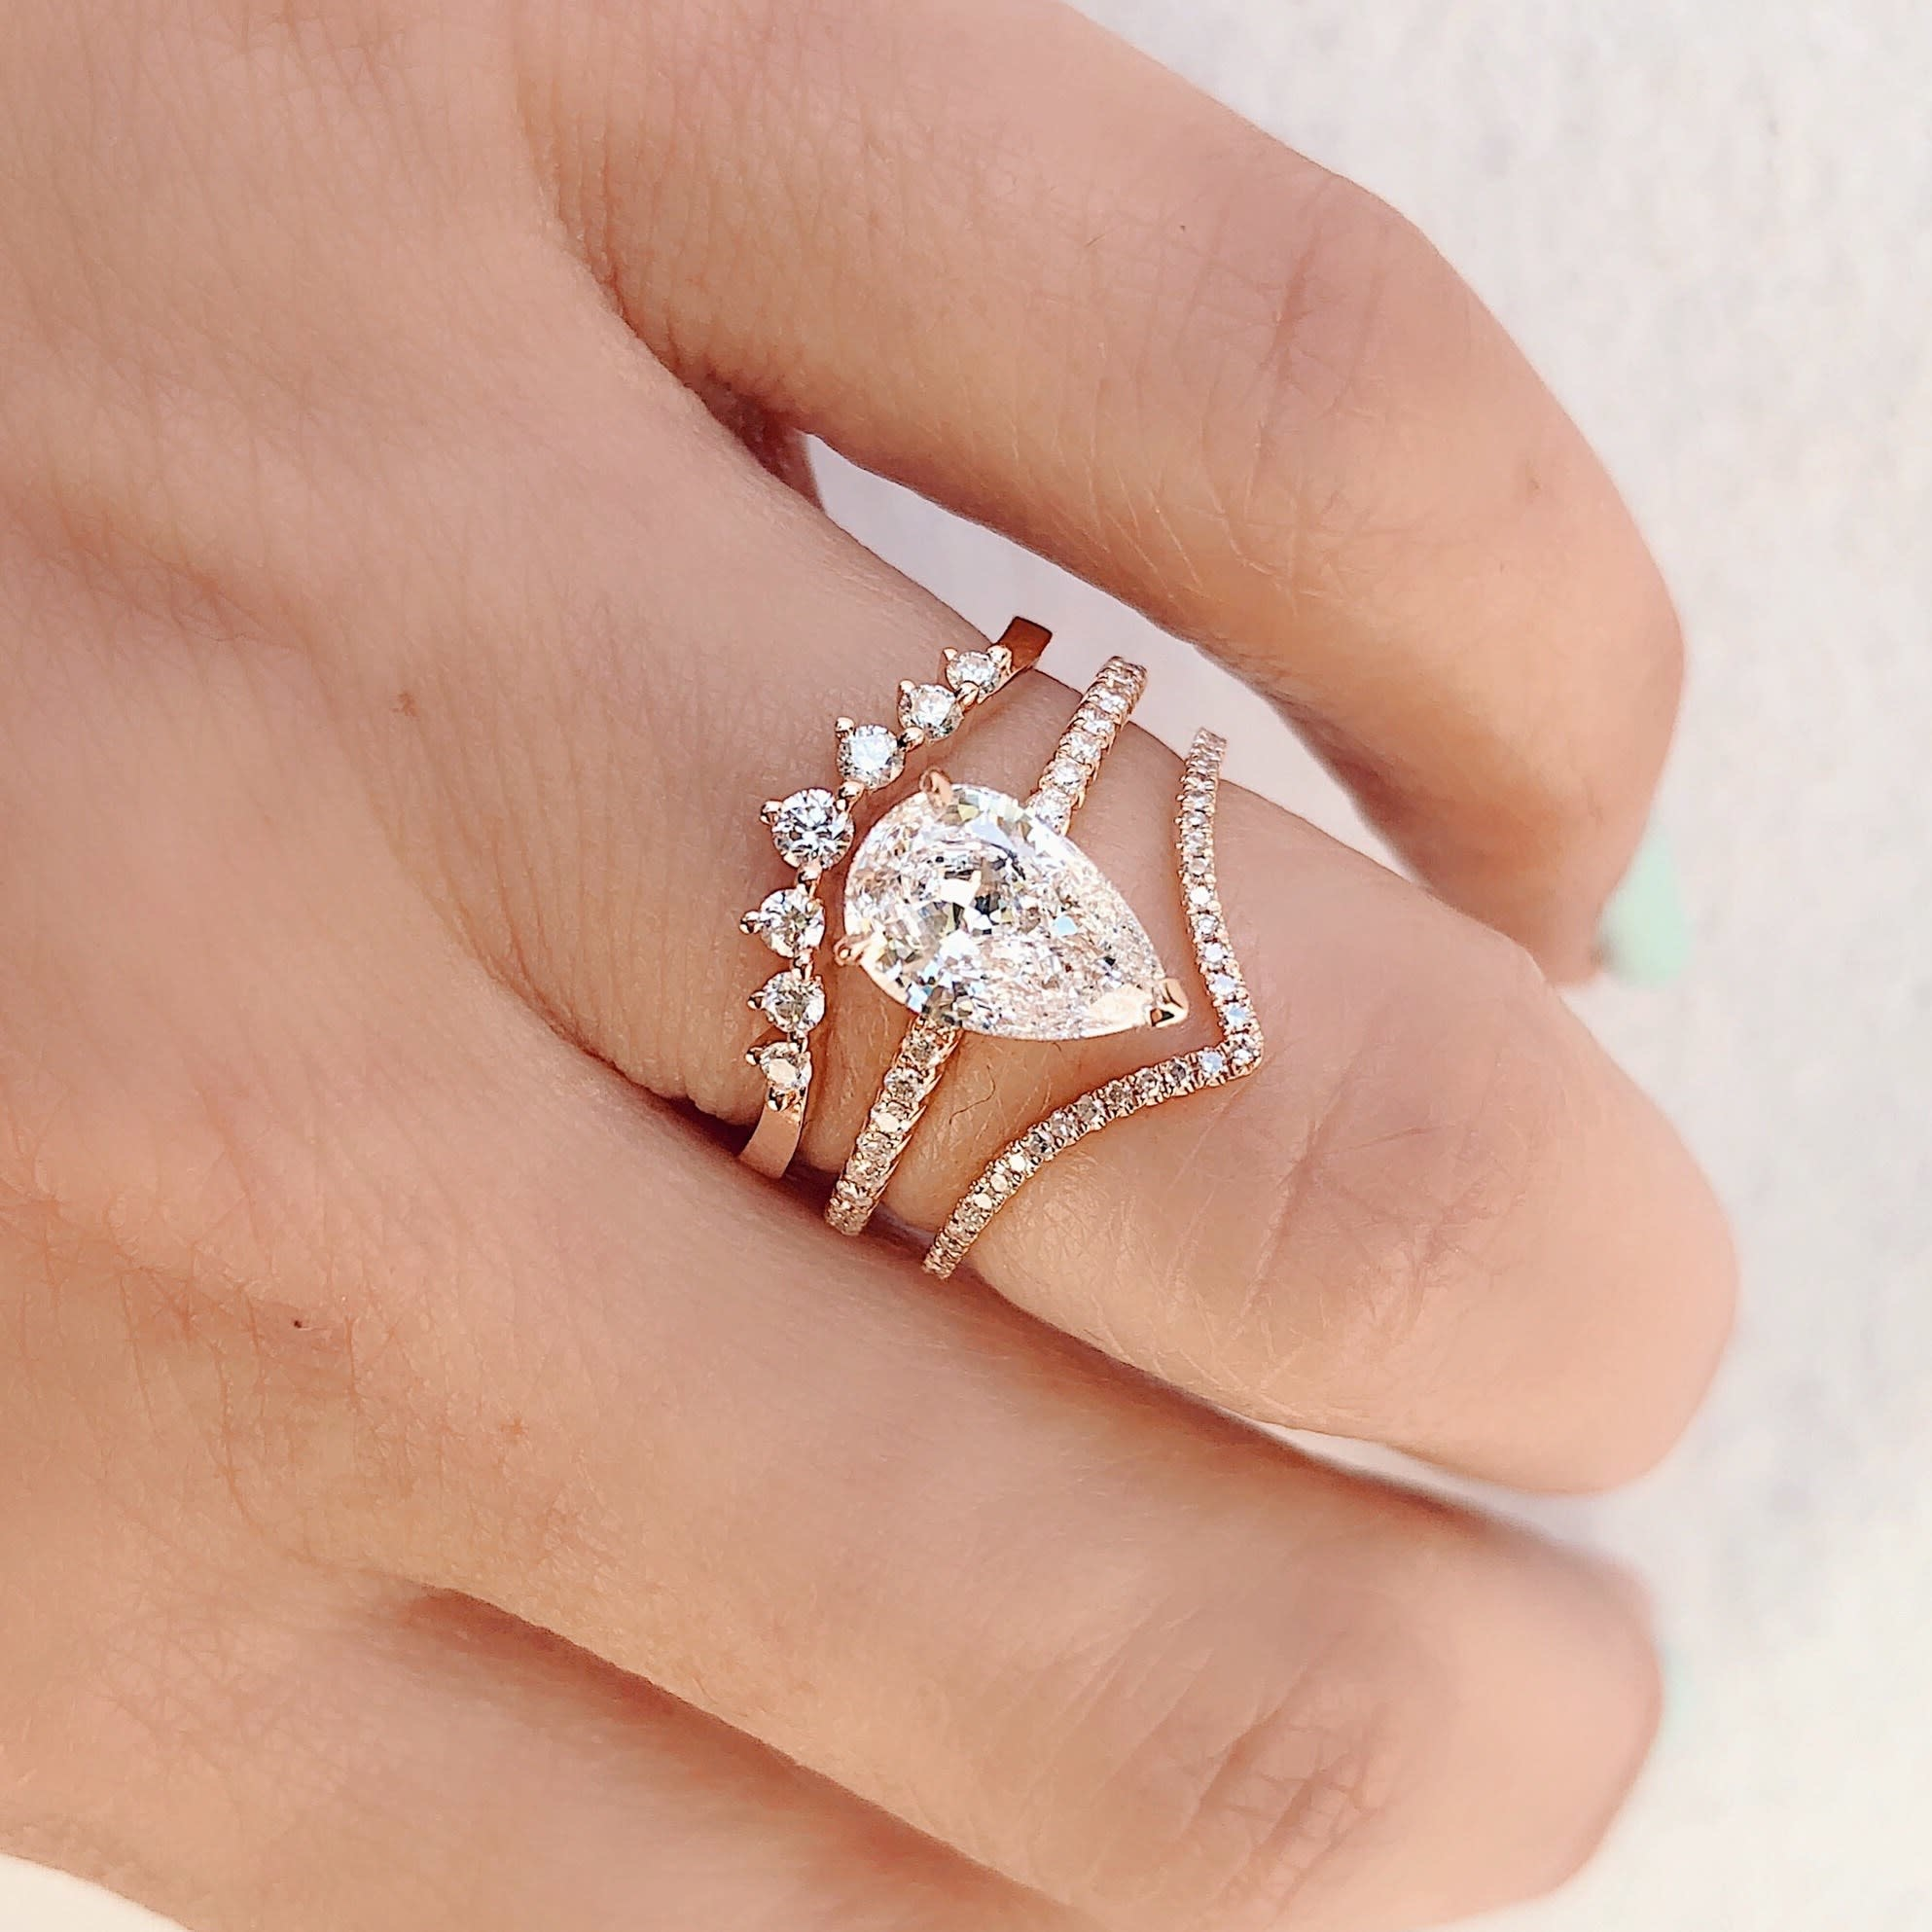 V Shaped Pave Diamond Rose Gold Ring